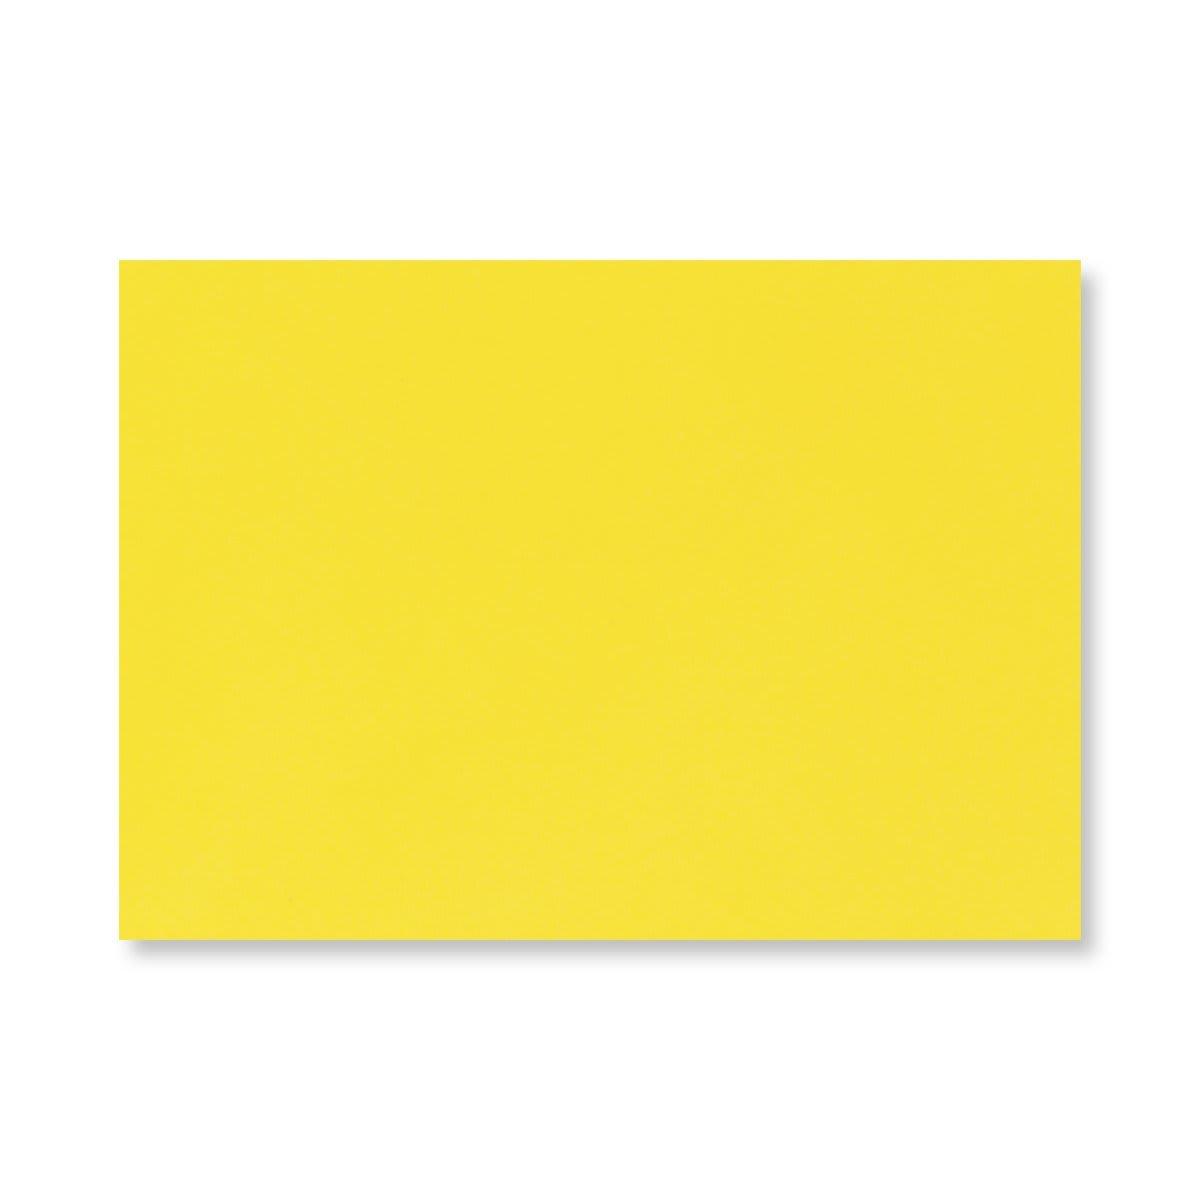 DAFFODIL YELLOW 133 x 184 mm ENVELOPES (i8)